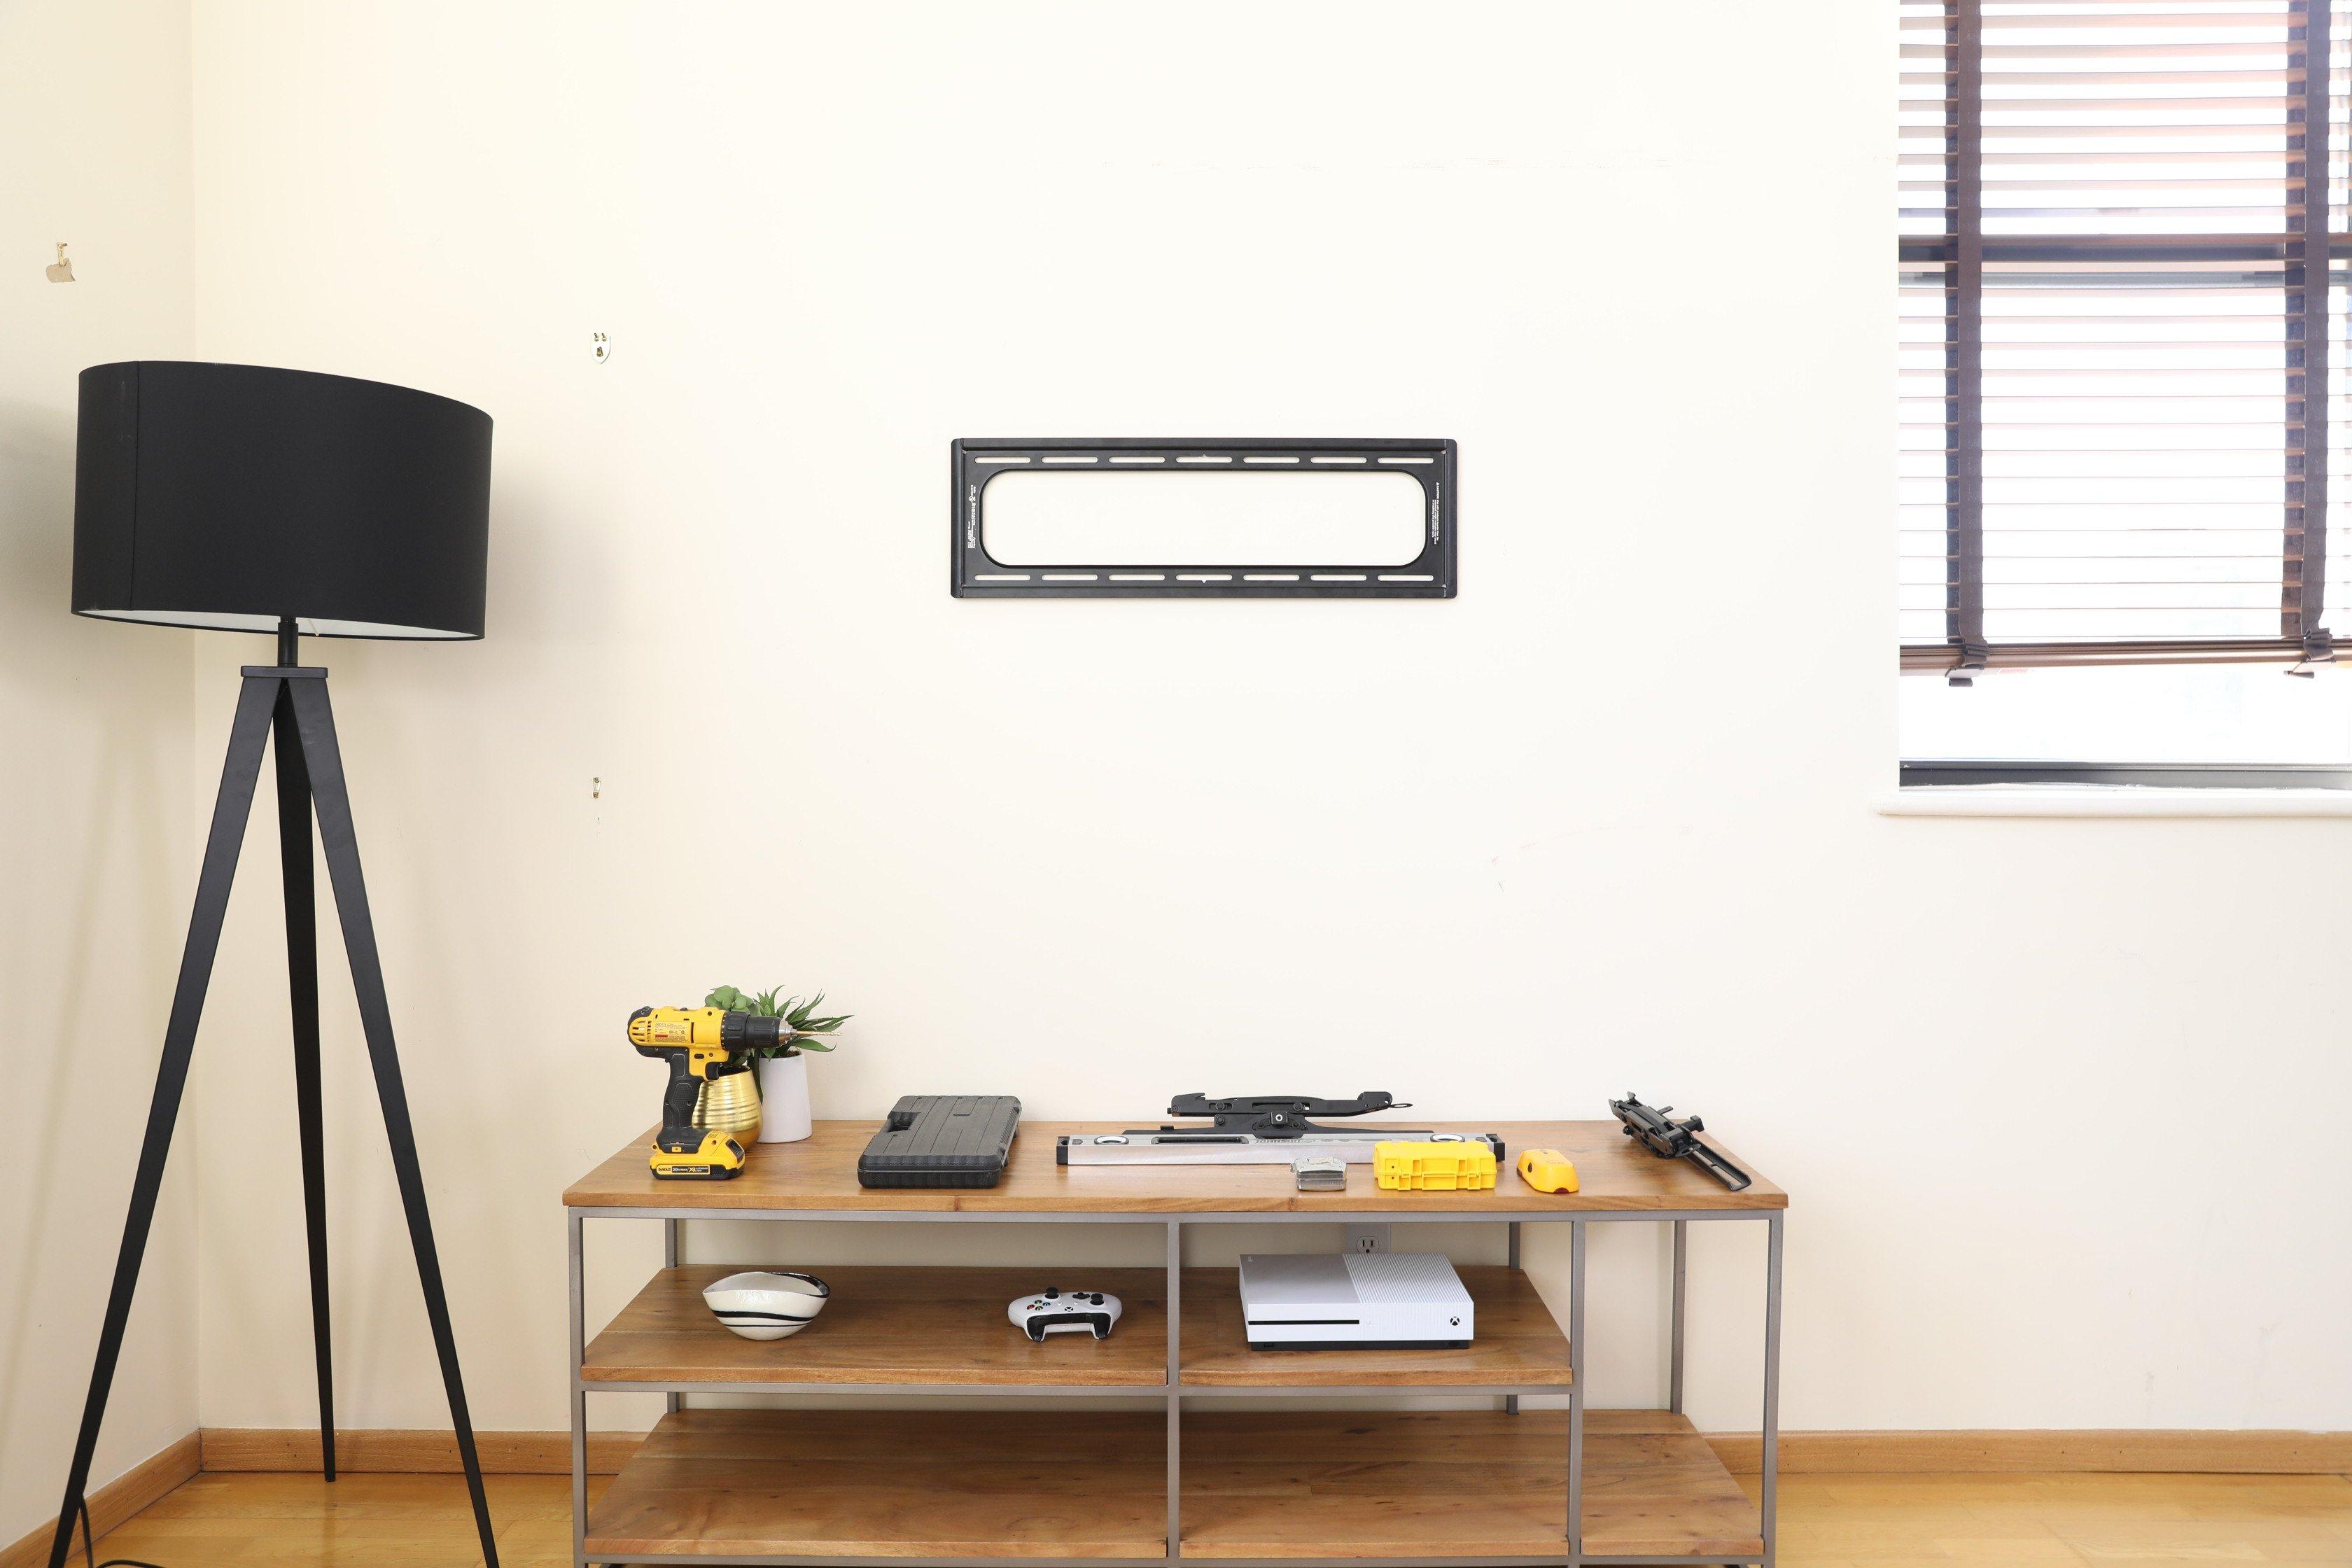 Fixed TV bracket installation